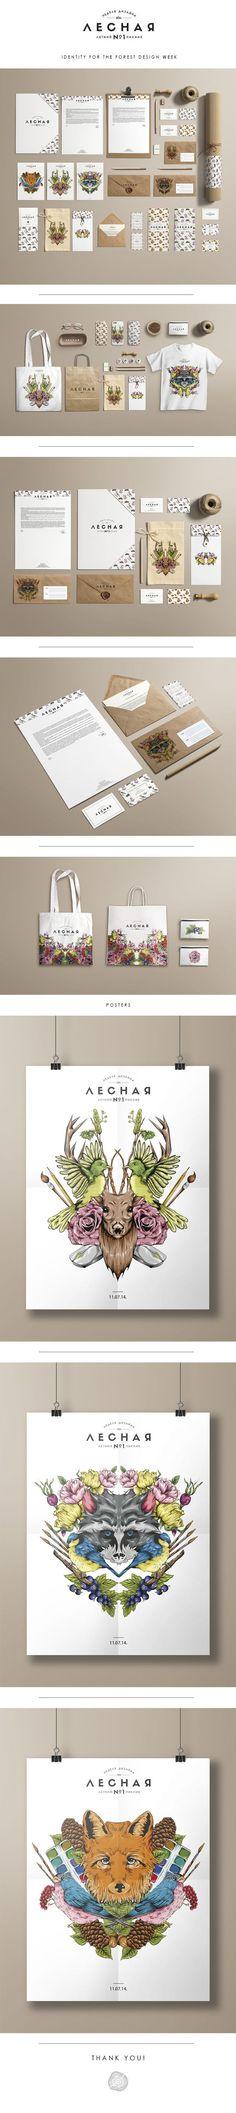 Cool Brand Identity Design. AECHAR. #branding #brandidentity